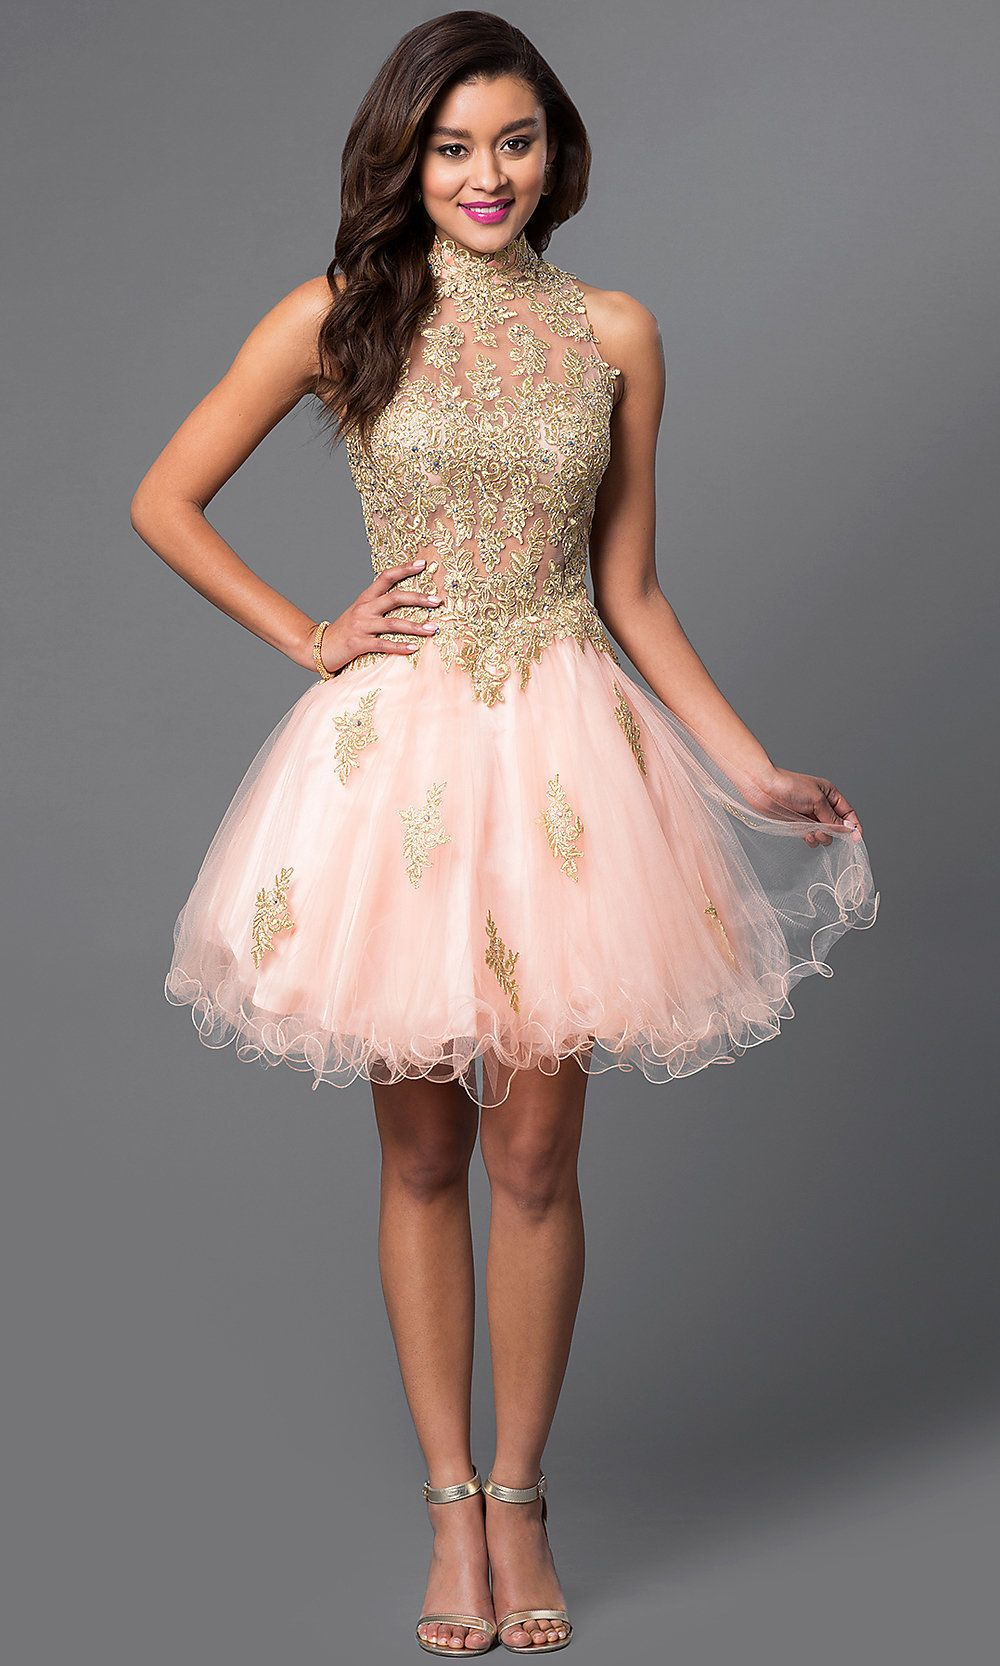 Prom Dresses, Plus Size Dresses, Prom Shoes -PromGirl